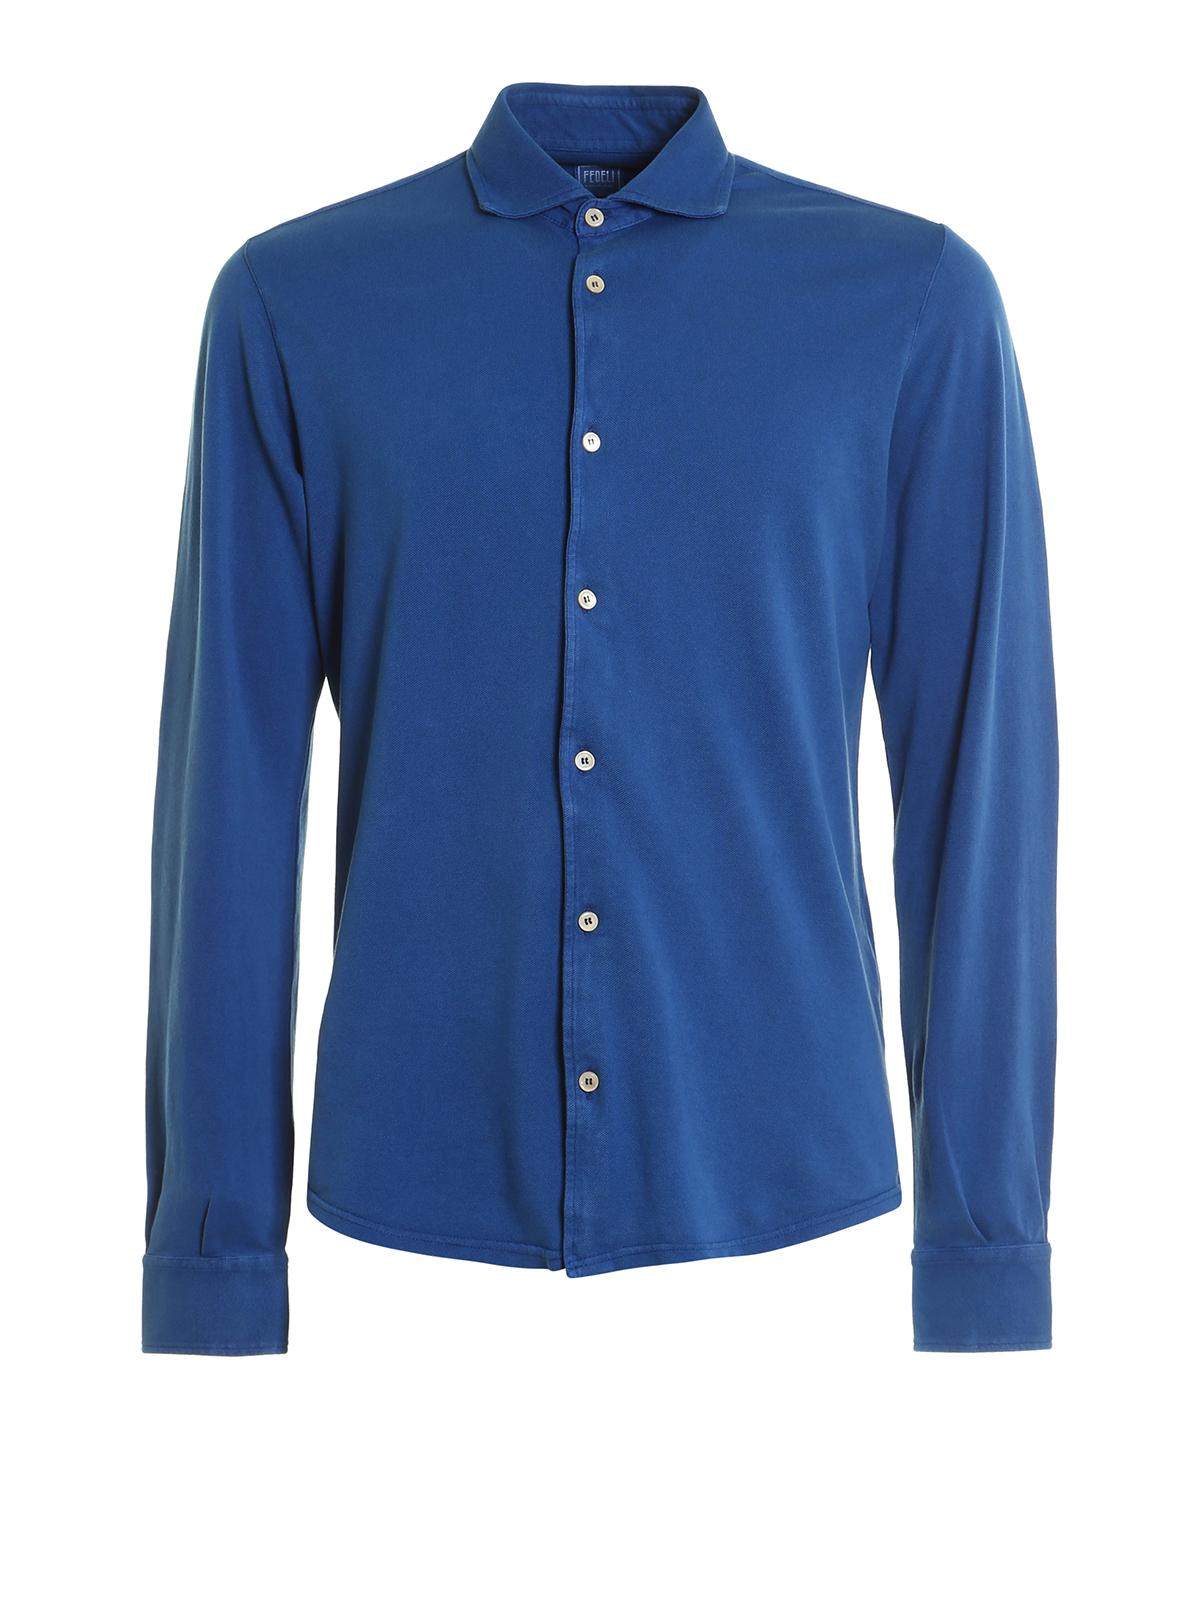 Steve Long Sleeve Pique Shirt By Fedeli Shirts Ikrix